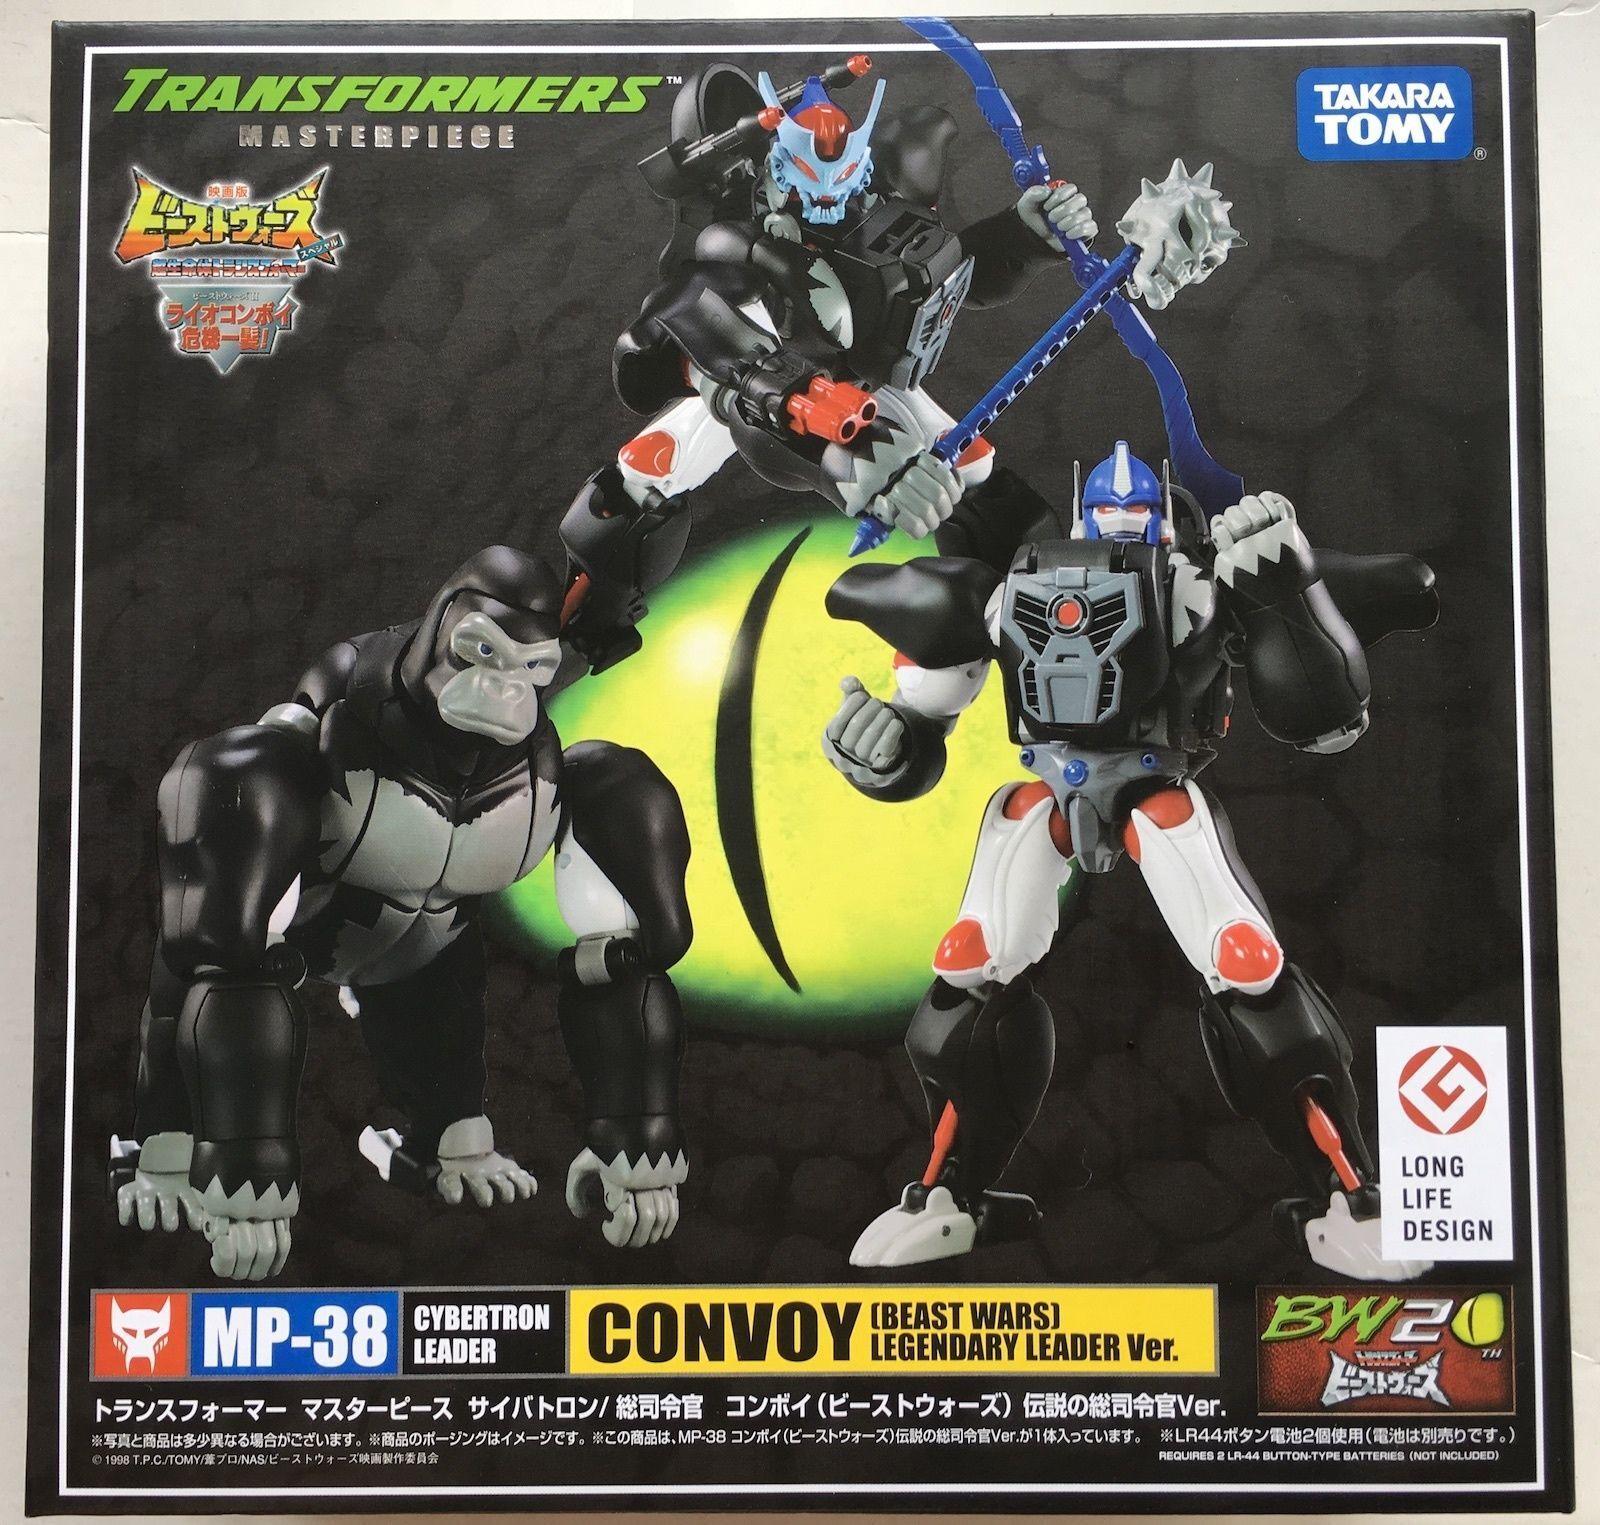 Transformers Takara Masterpiece MP-38 Optimus Primal nuevo comandante supremo